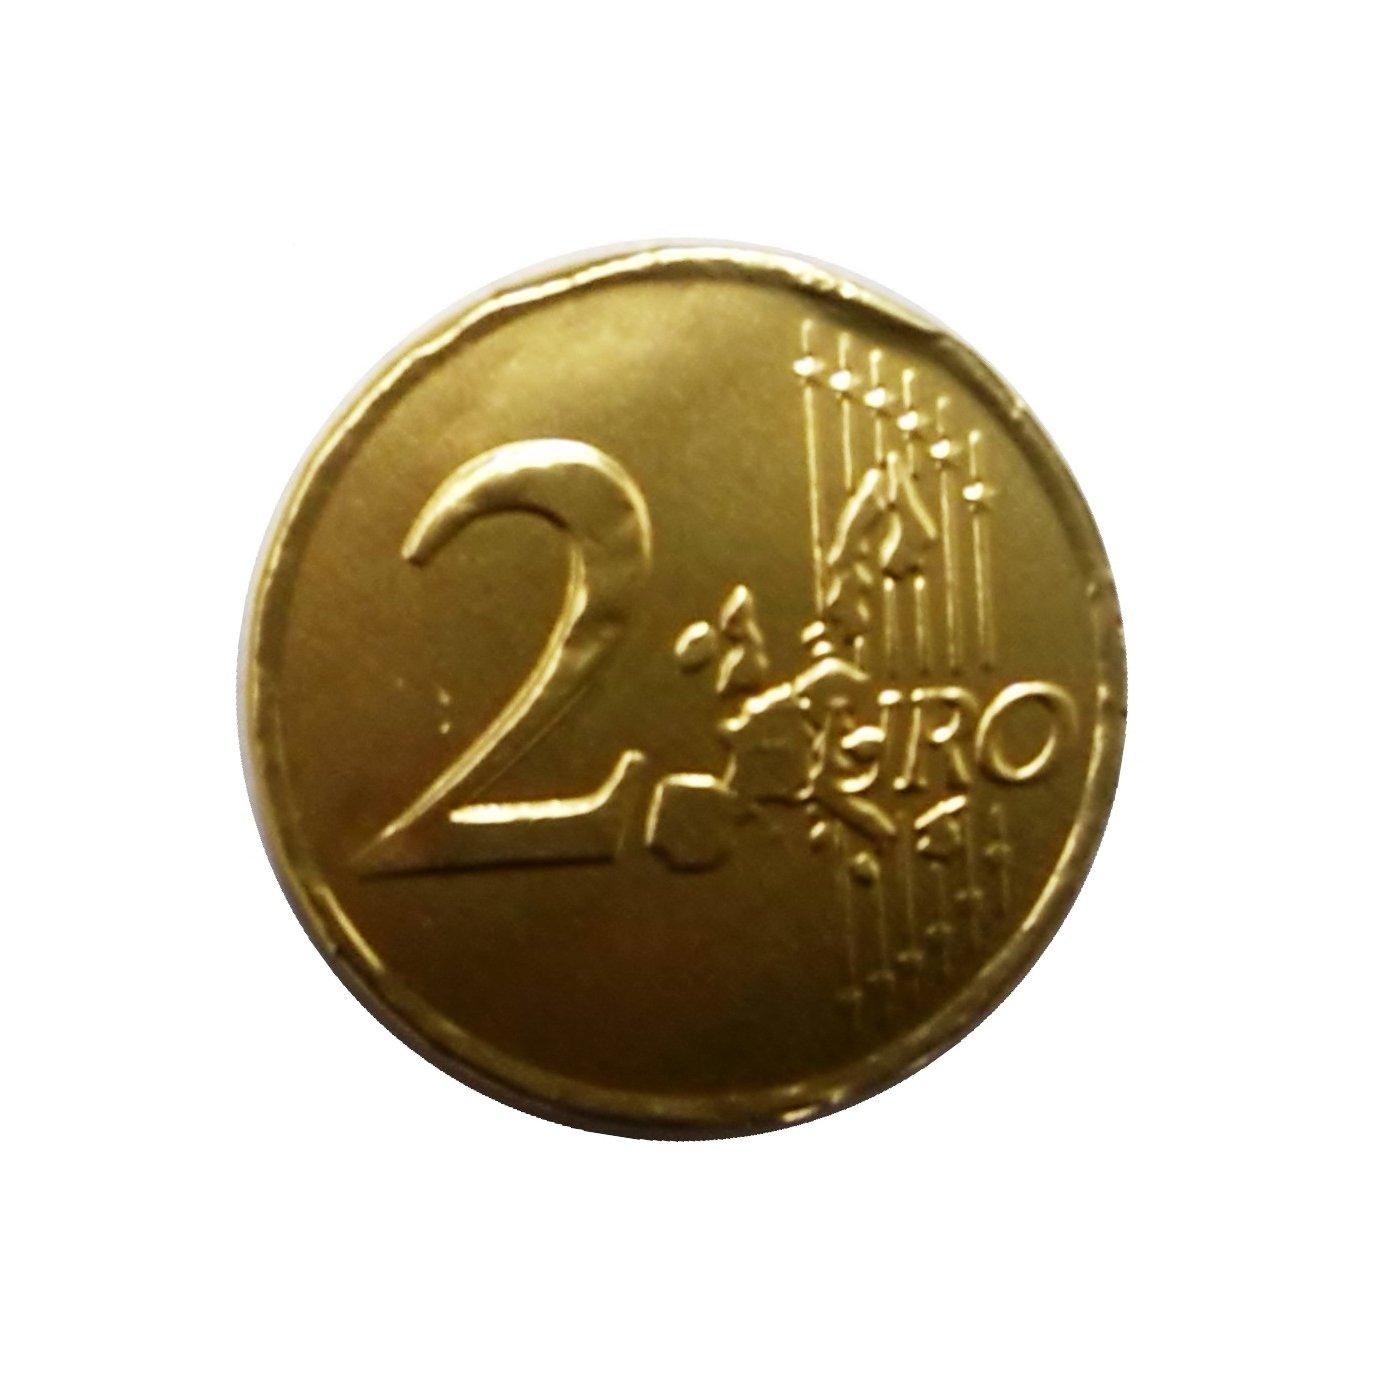 120 x Milk Chocolate Money - Gold Foiled 2 Euro Coins (Wholesale ...